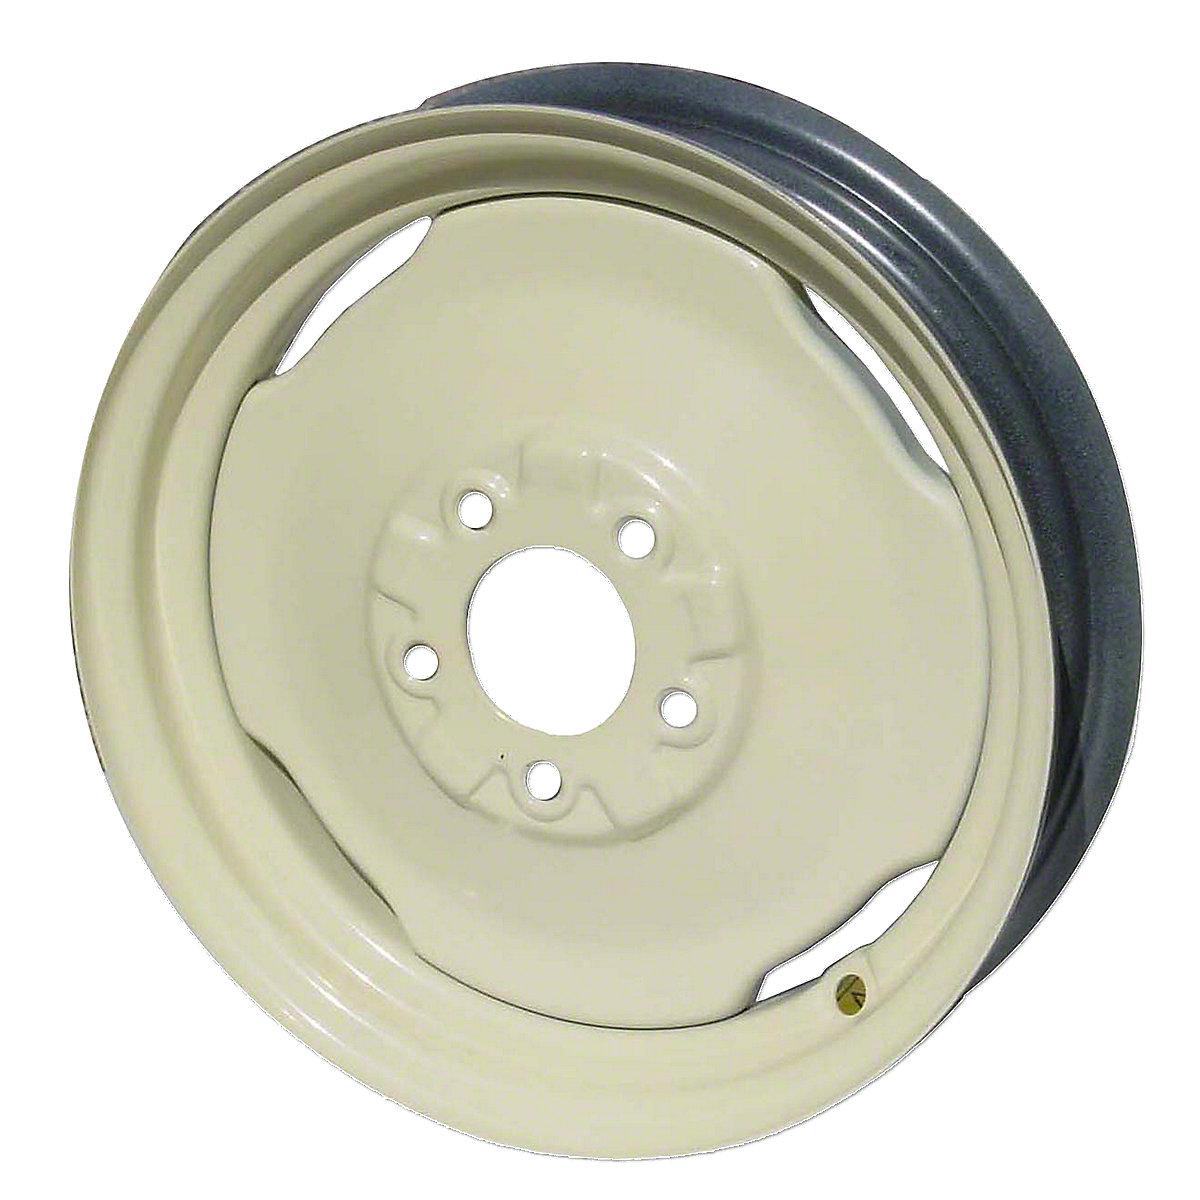 3X15 Front Wheel For Allis Chalmers: B, C, CA, D10, D12.